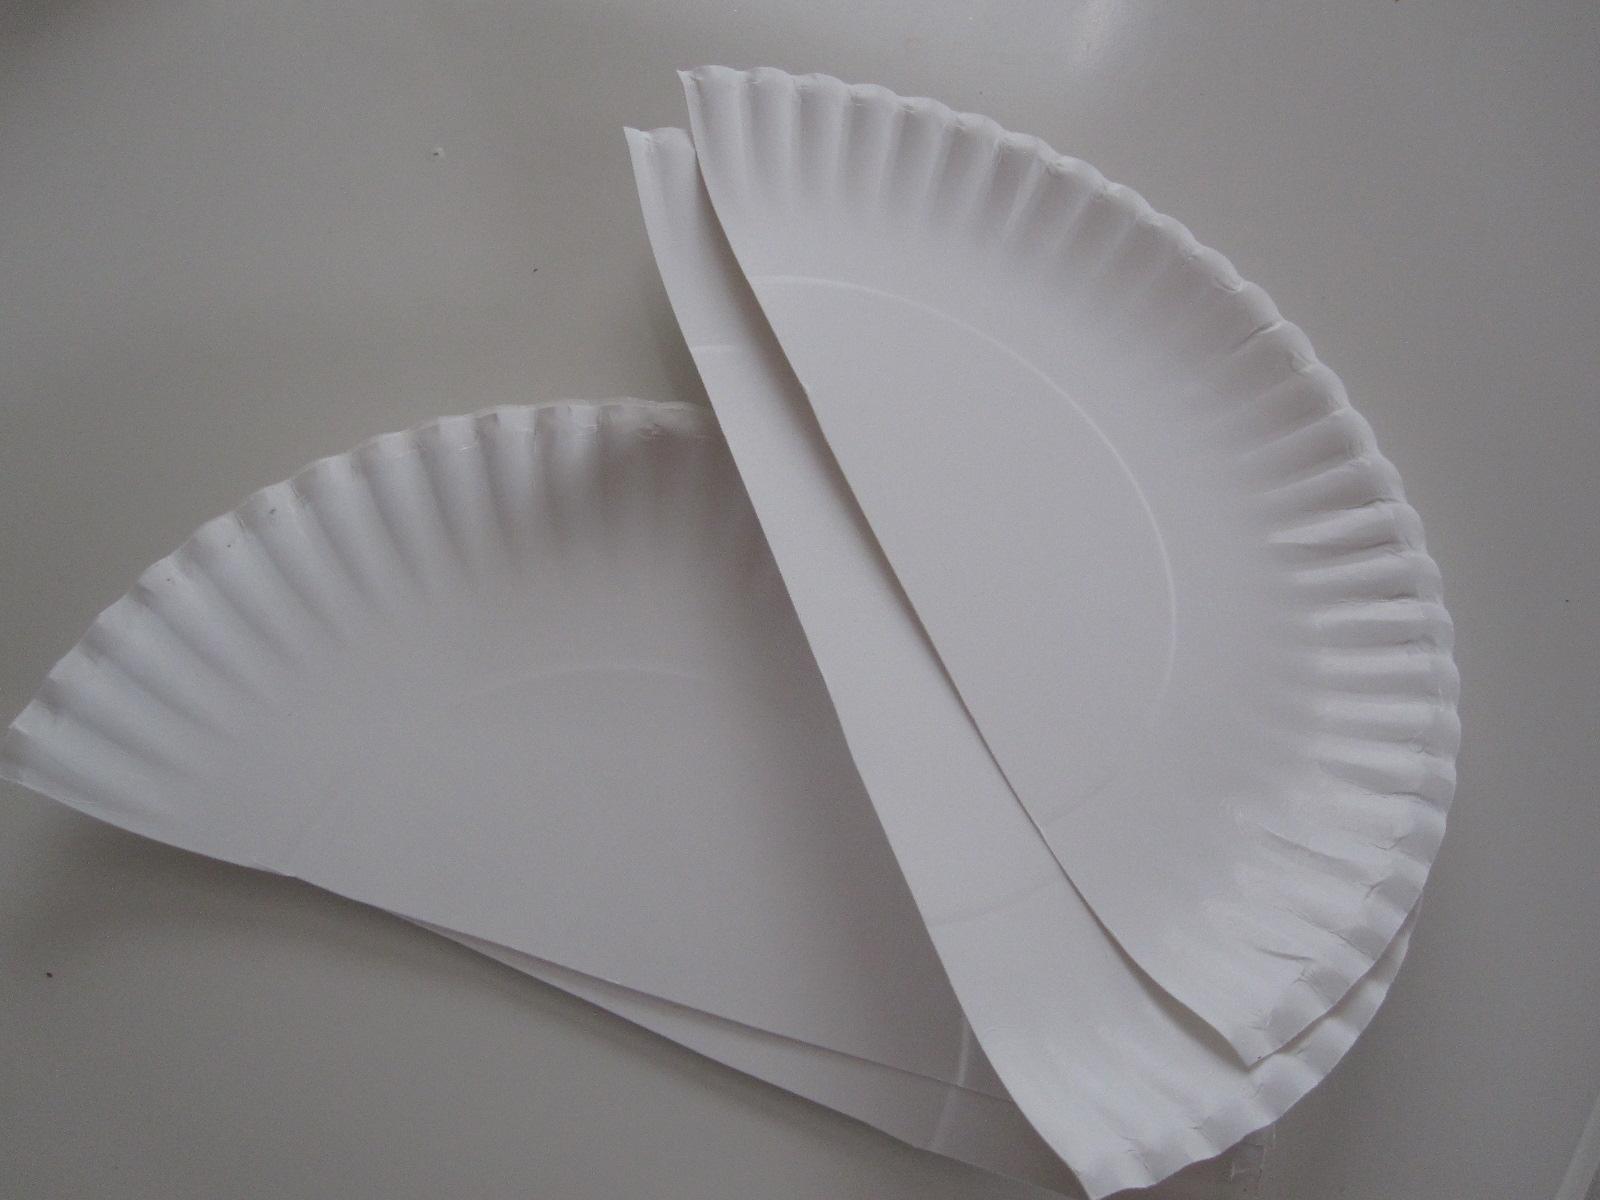 Paper Plate Emotion Masks - No Time For Flash Cards